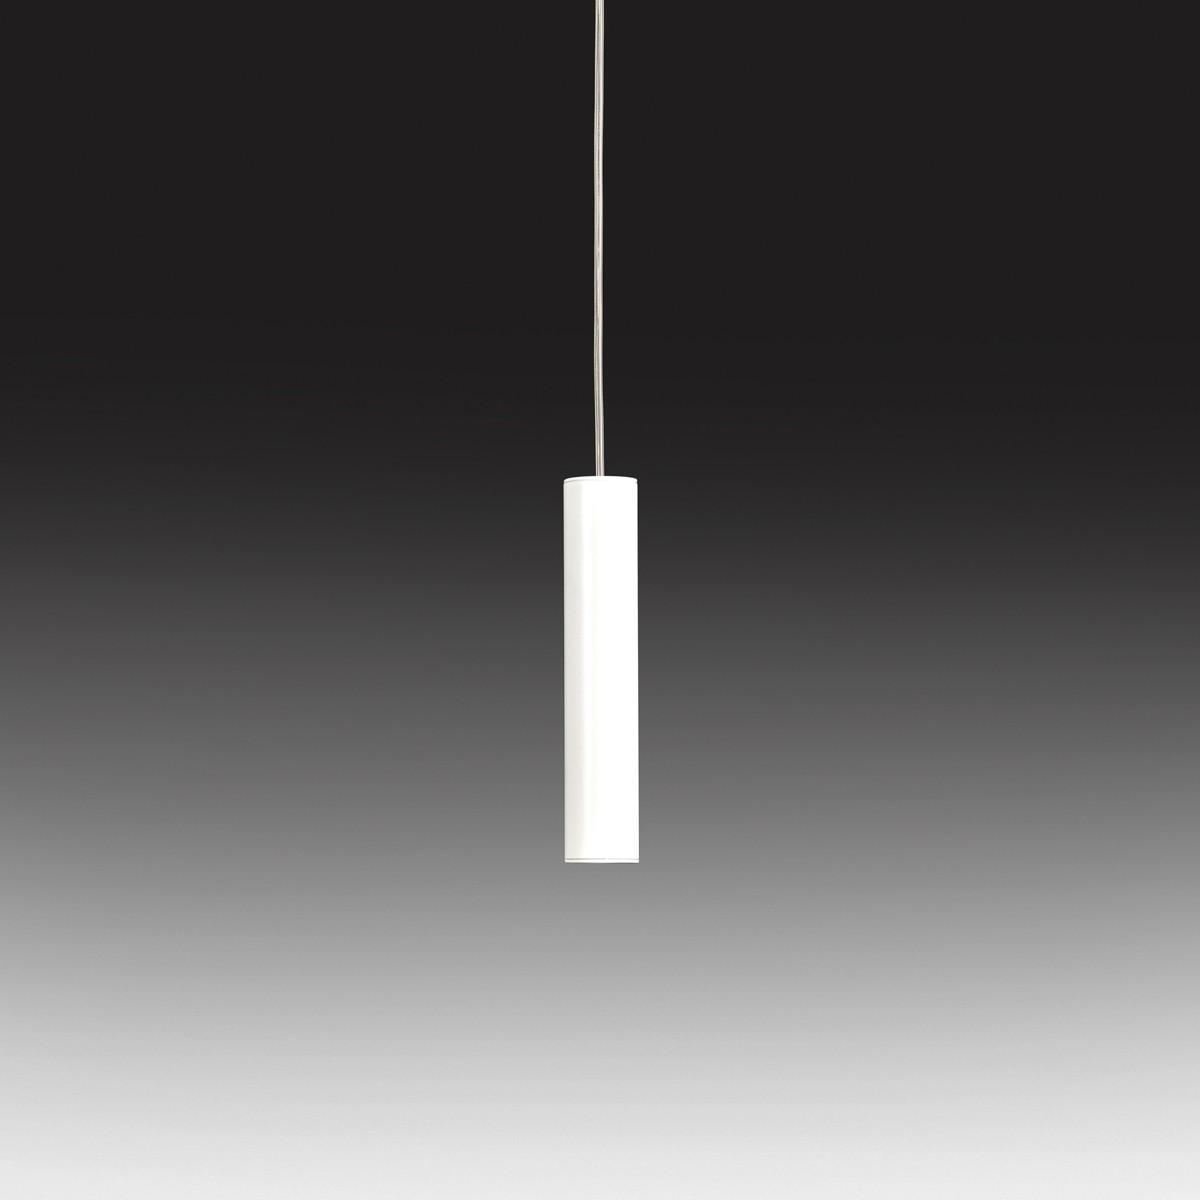 Milan Tub LED Pendelleuchte, weiß lackiert